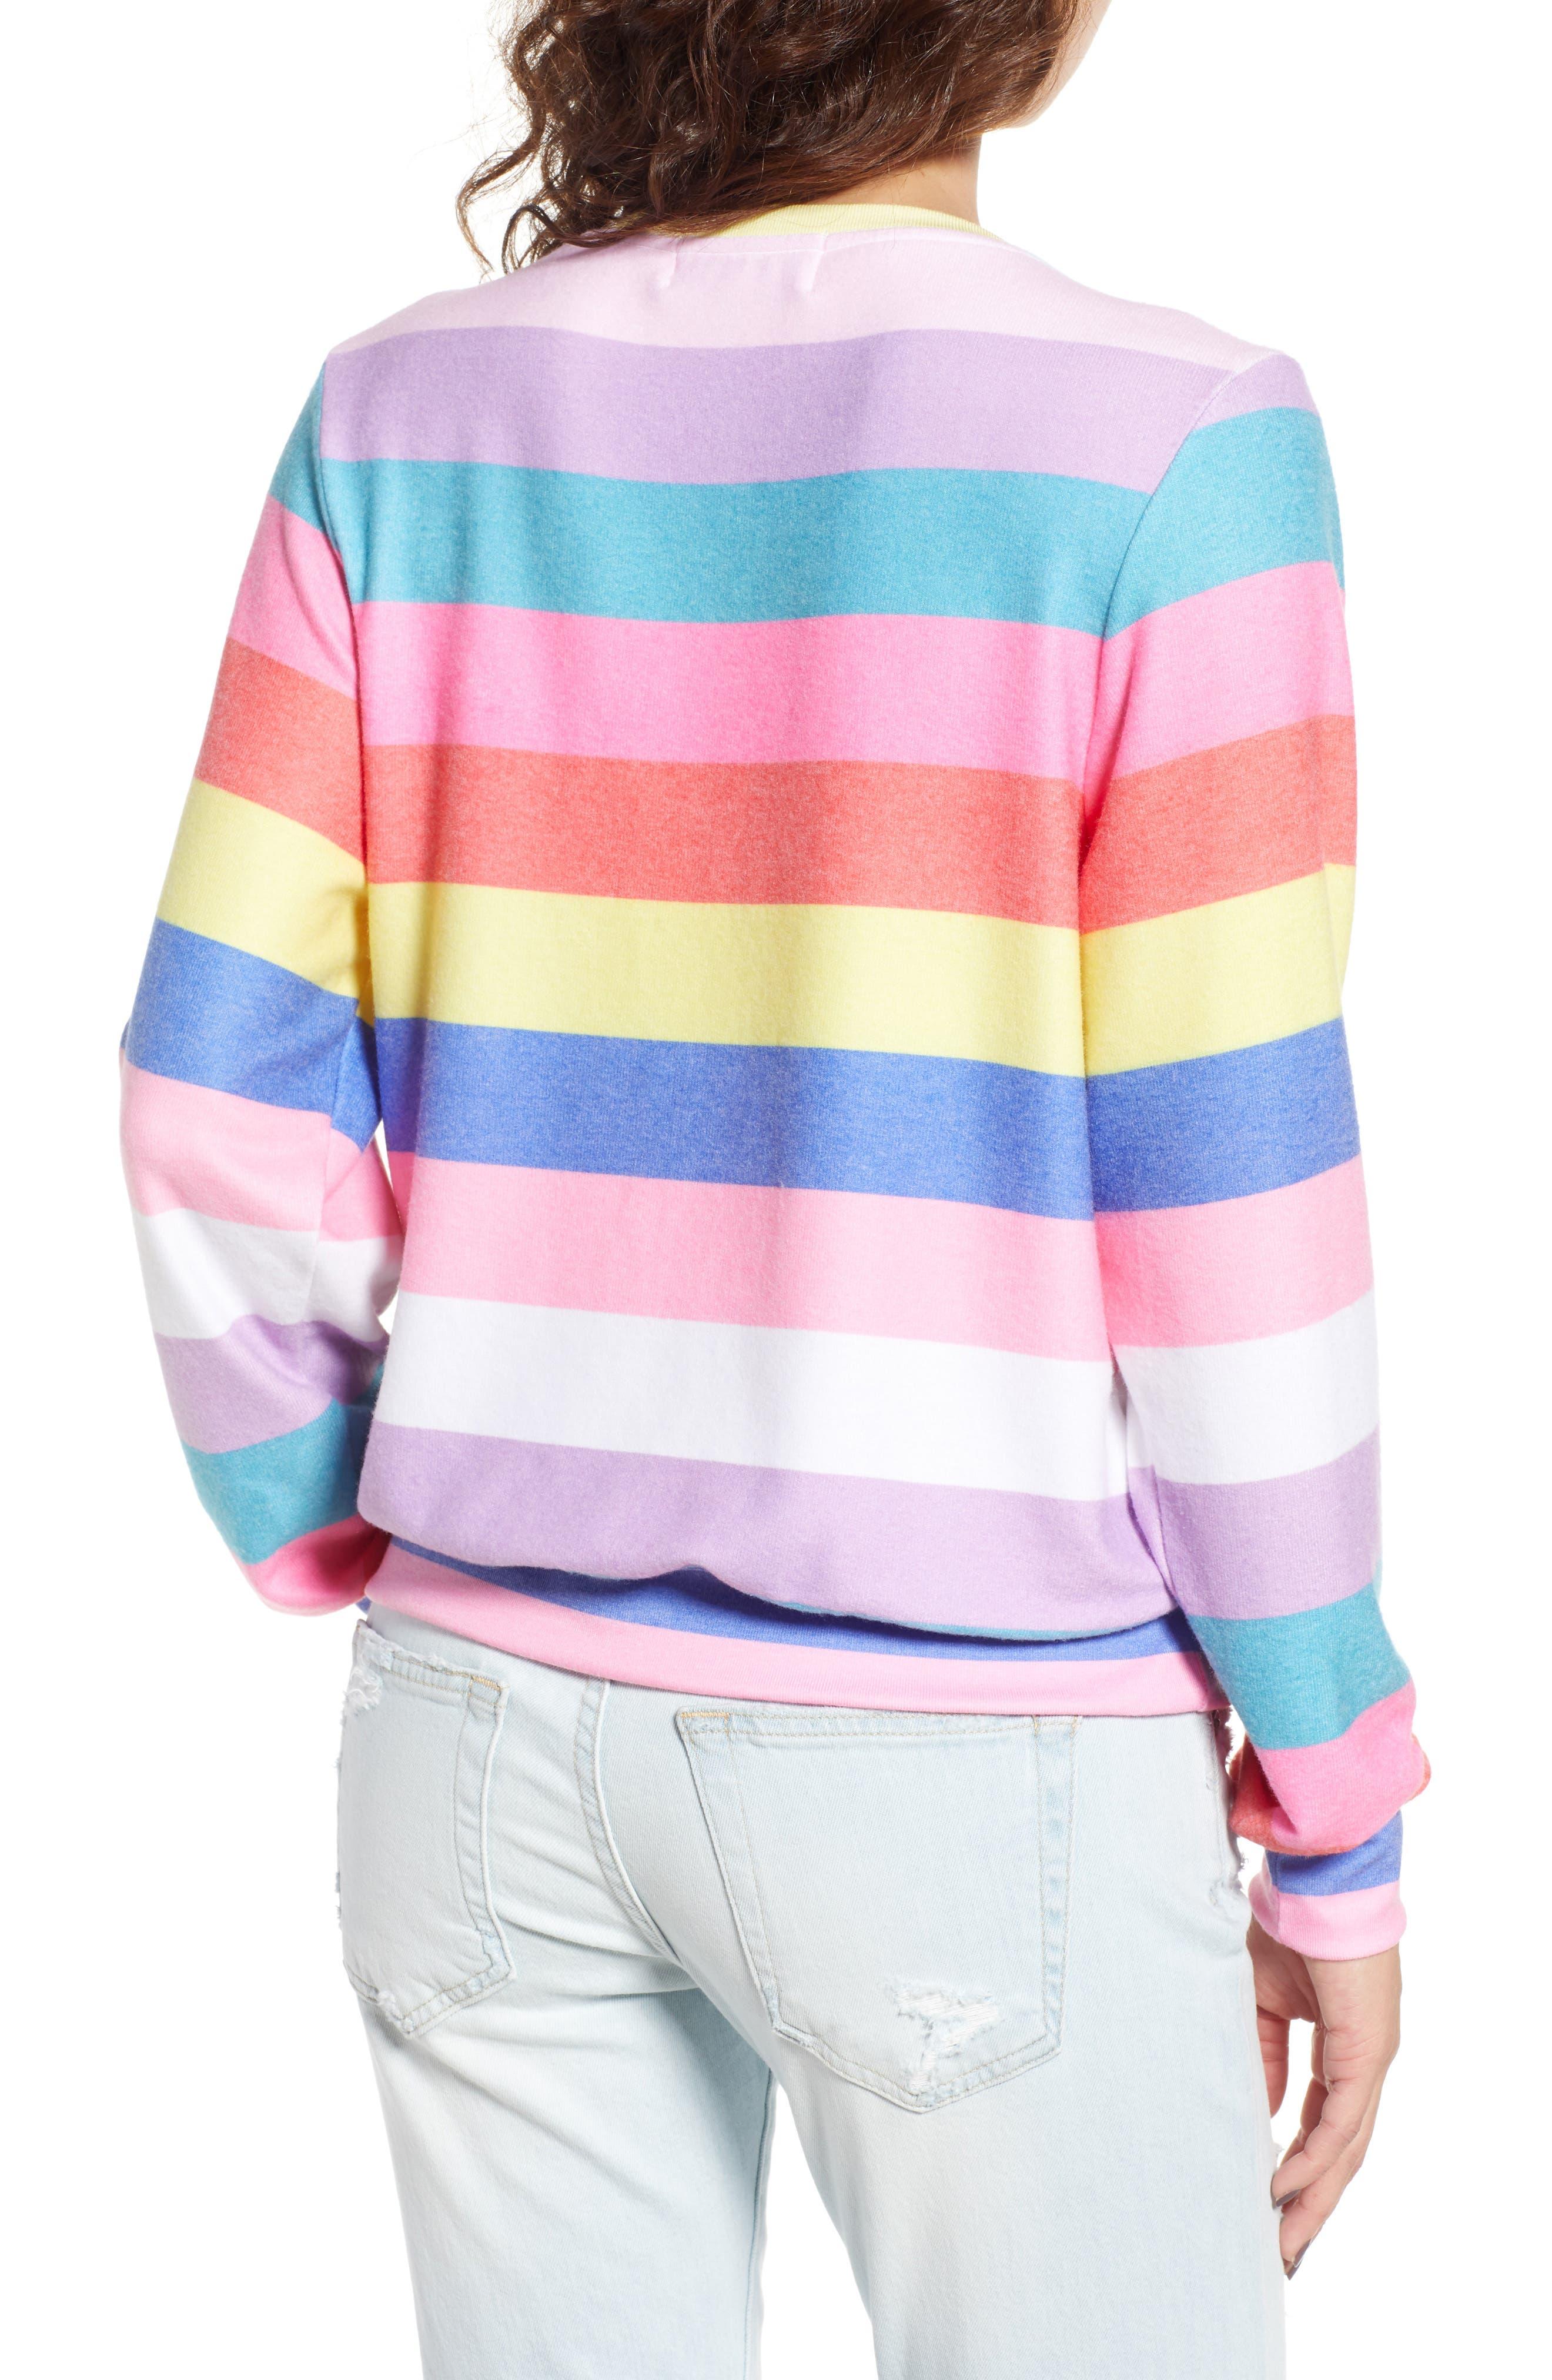 Castaway Roadtrip Sweatshirt,                             Alternate thumbnail 2, color,                             Multi Colored